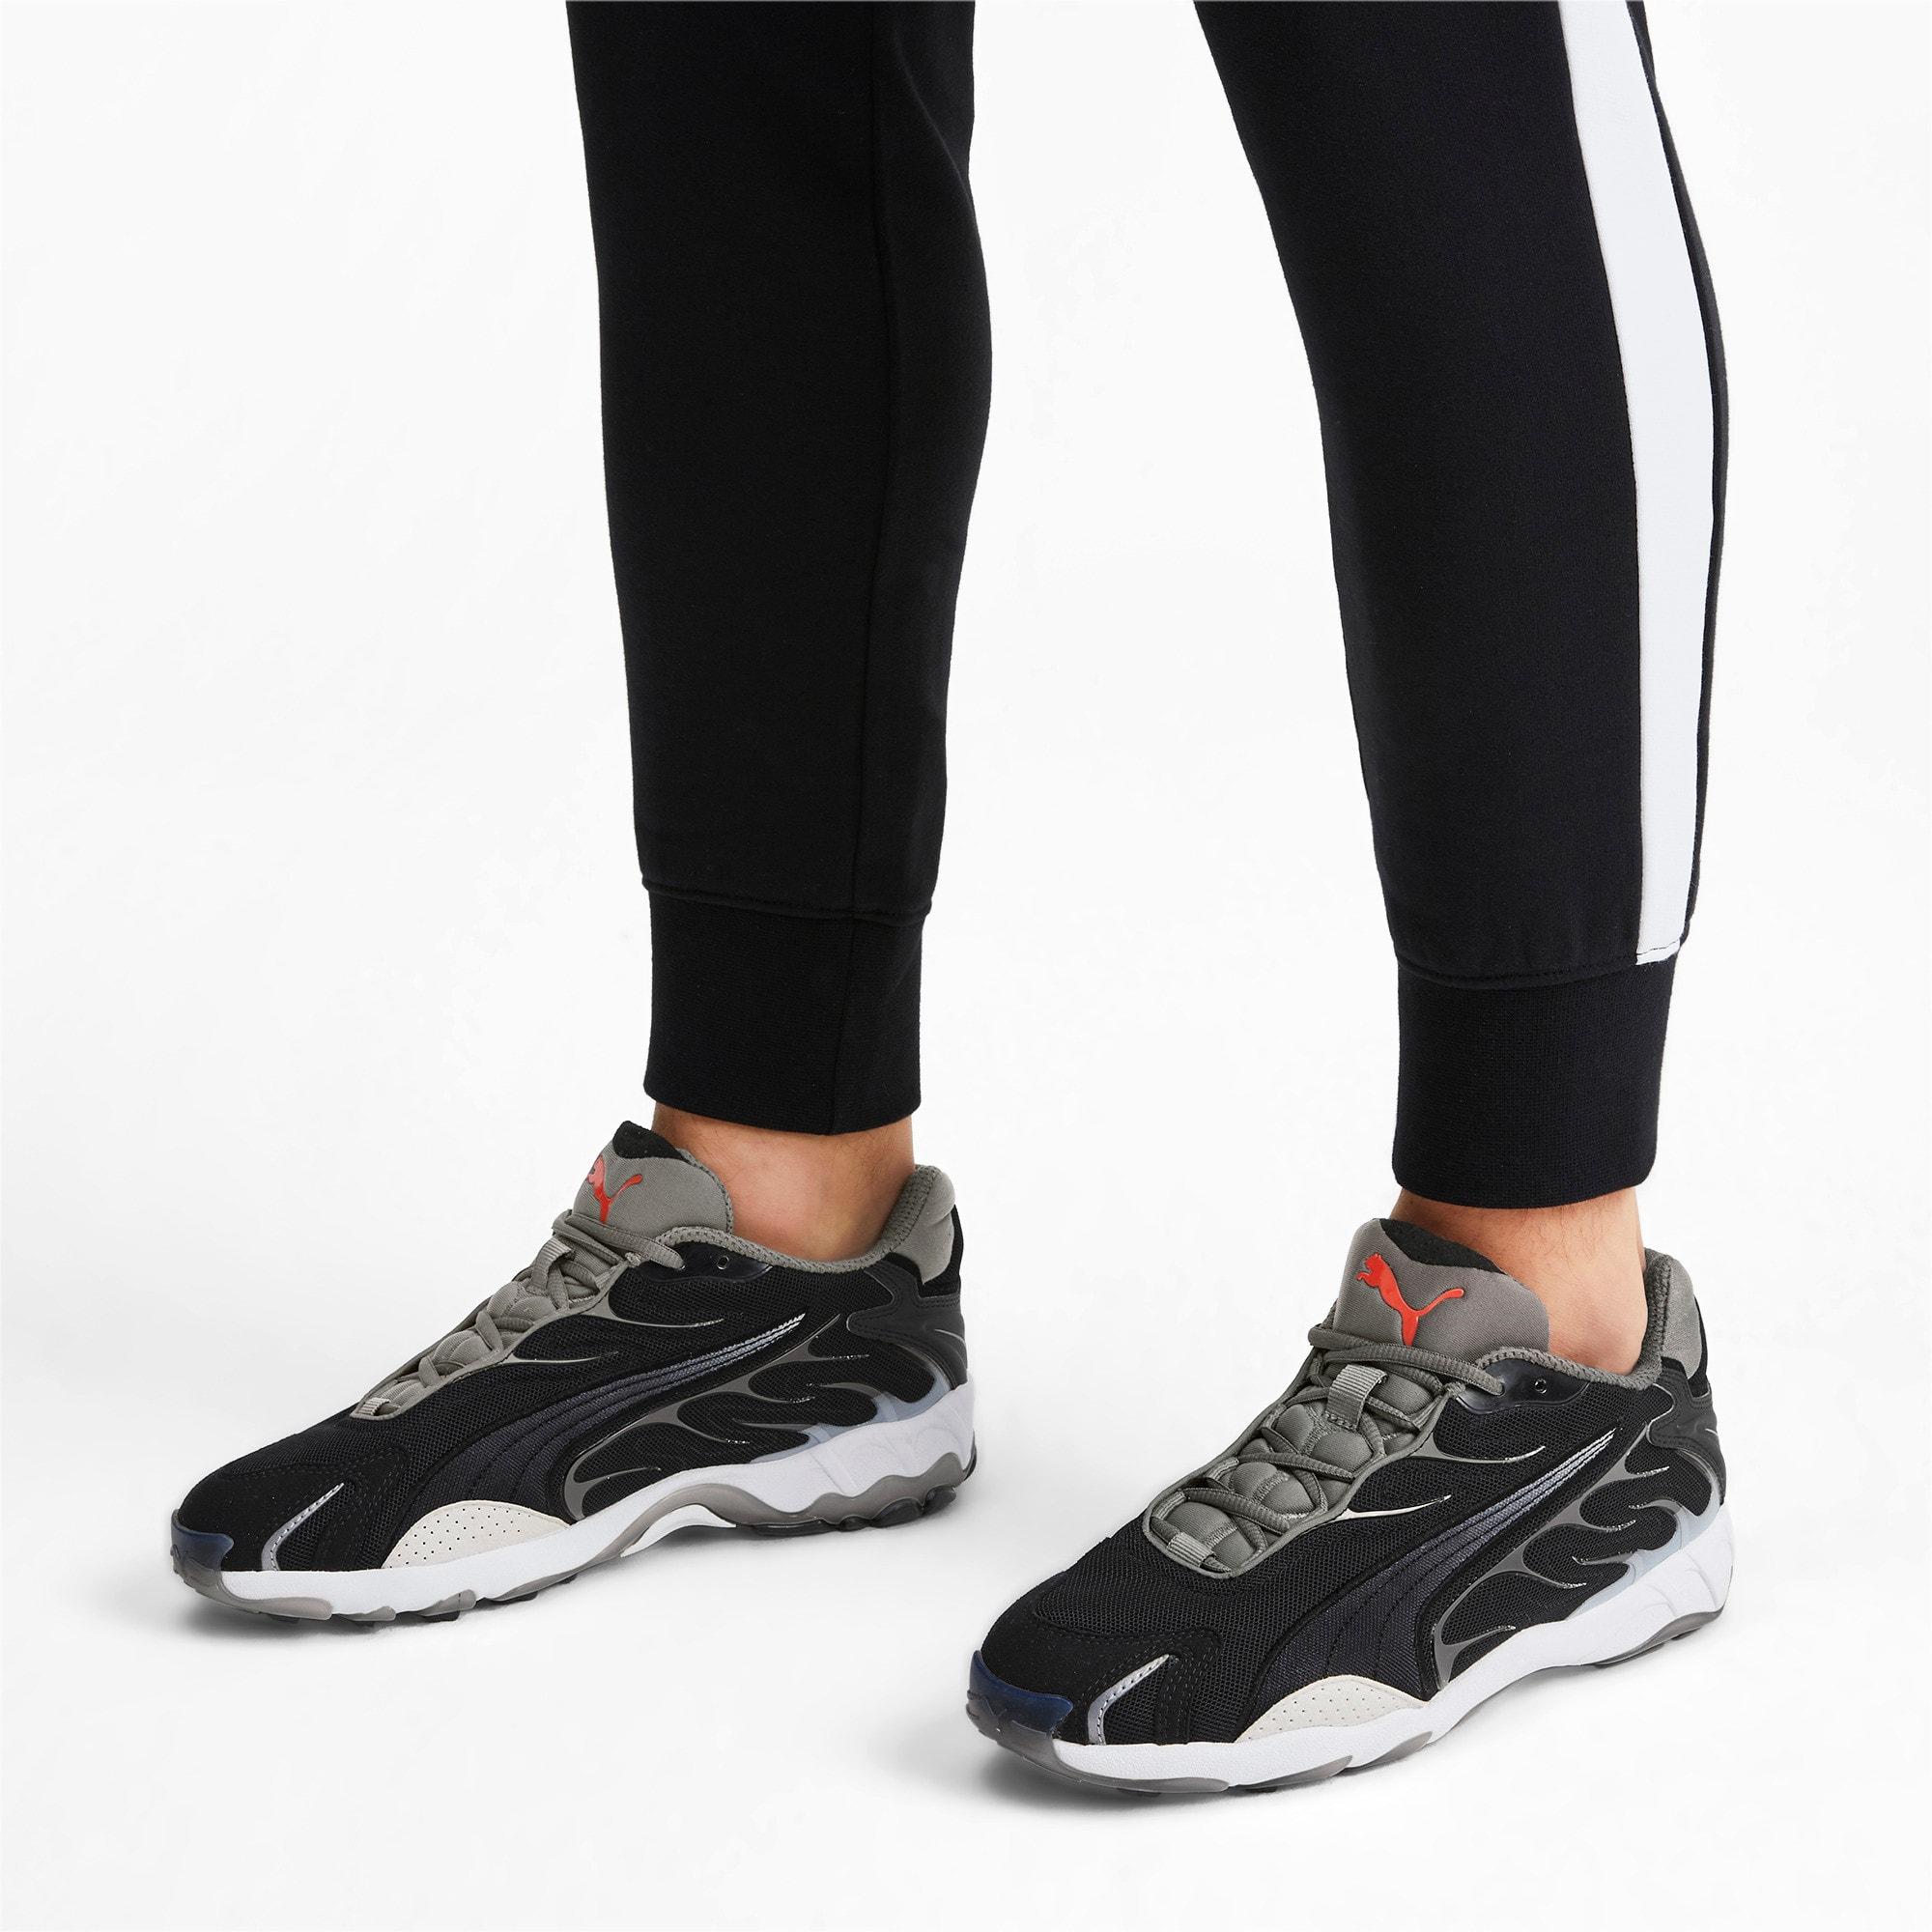 Thumbnail 2 of Inhale Flares Sneakers, Puma Black-Puma White, medium